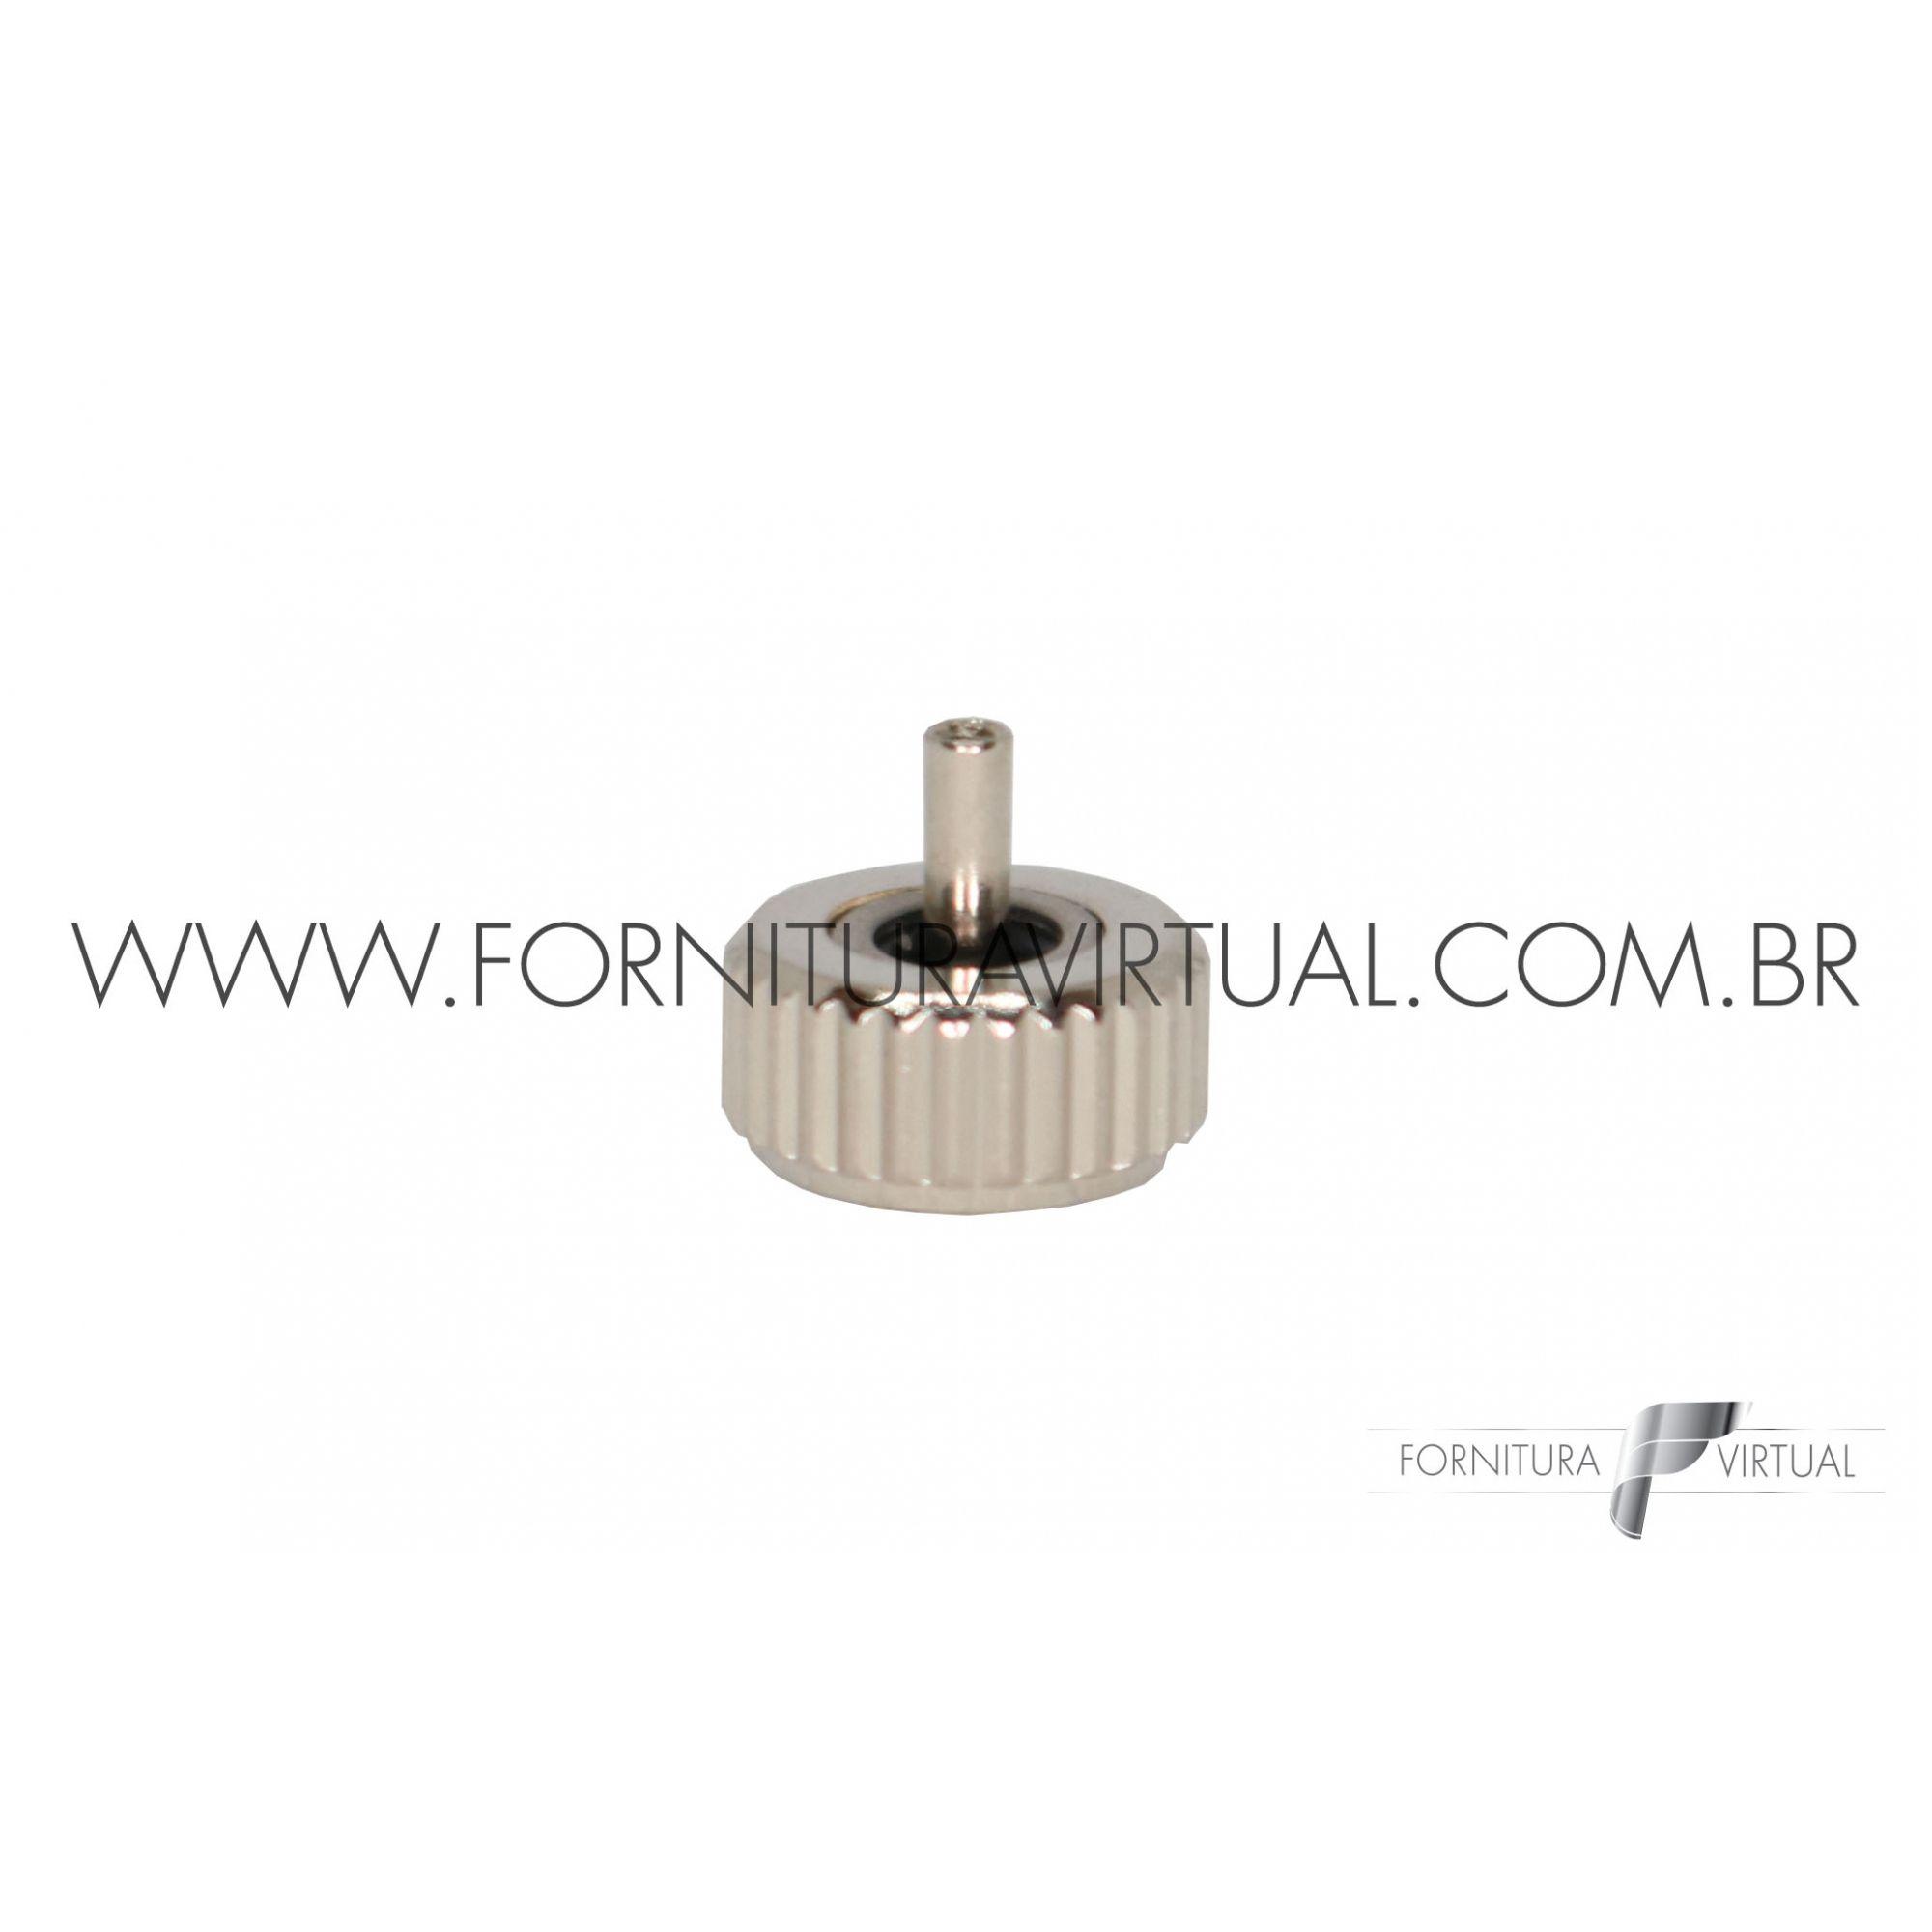 Coroa Capeada - 7.0 x 3.5 x 6.5 - Tubo 2.5